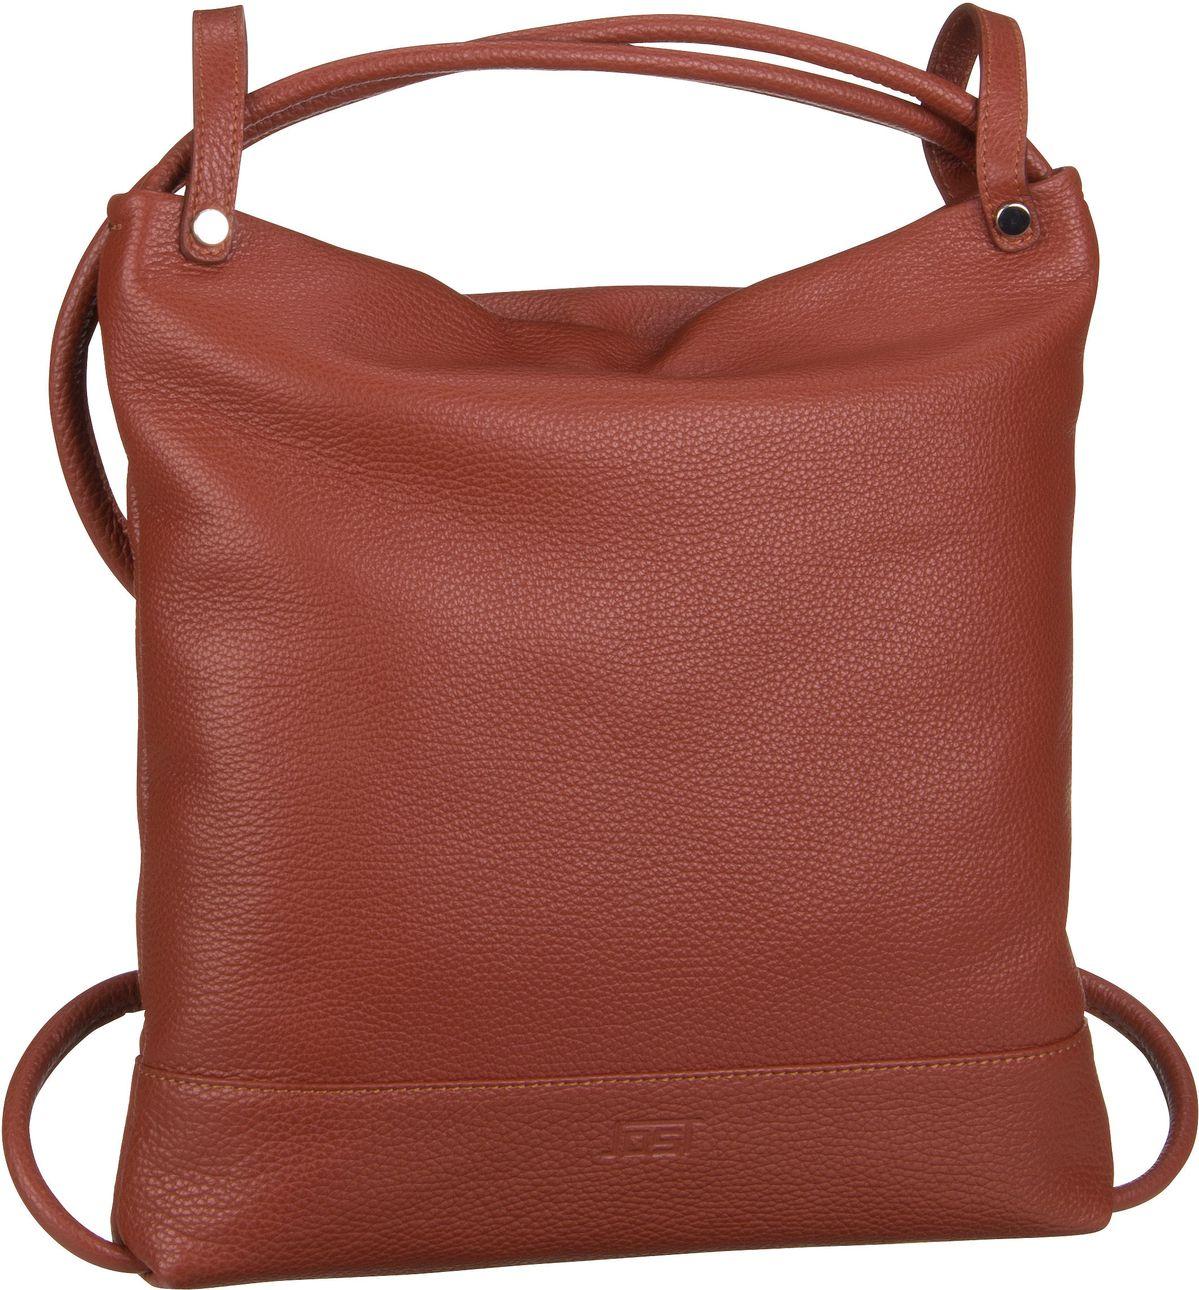 Rucksack / Daypack Vika 1831 Hobo Bag Backpack k